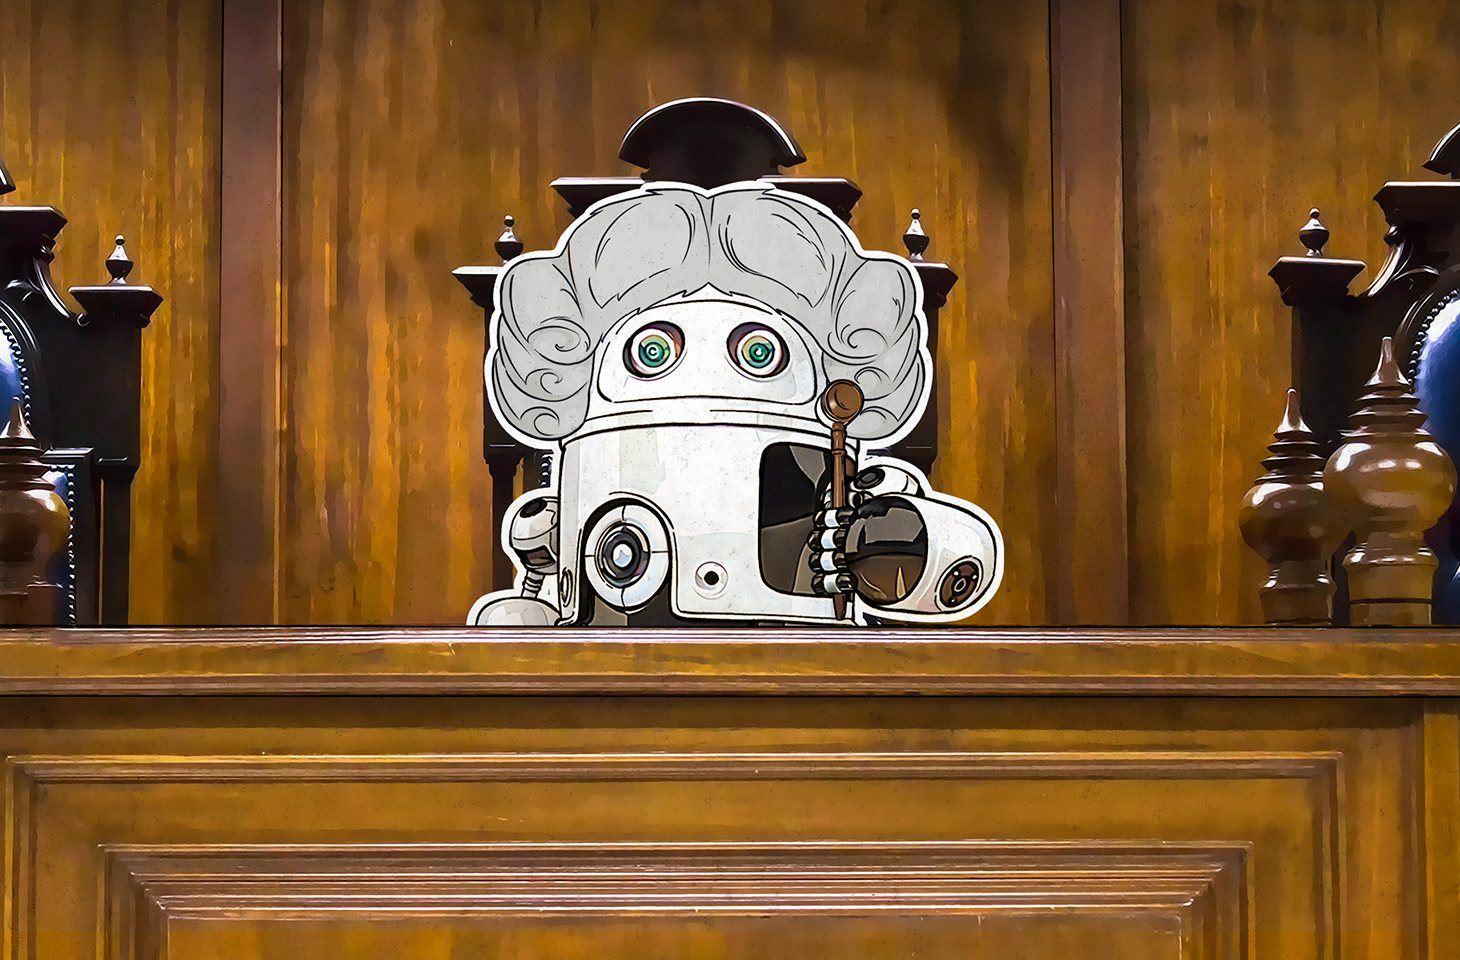 Renzo Cavalieri : Il giudice e l'algoritmo. L'Intelligenza Artificiale arriva nei tribunali Cinesi